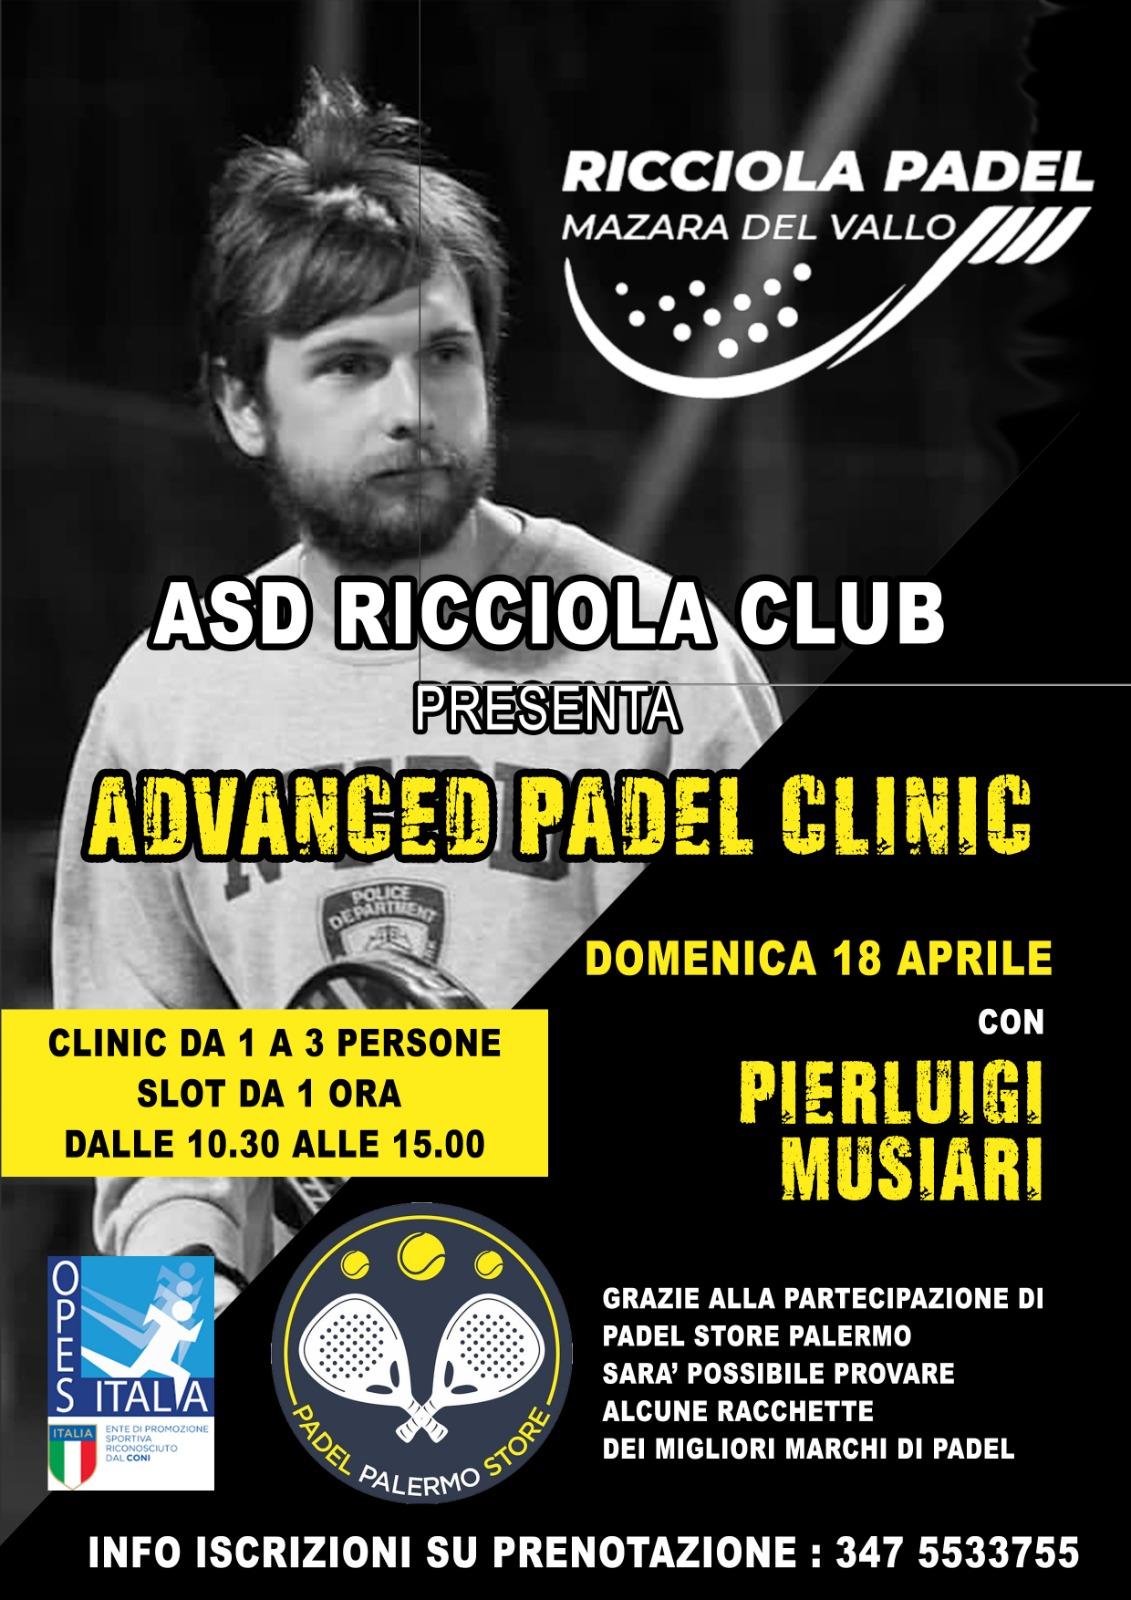 advanced padel clinic 18 aprile